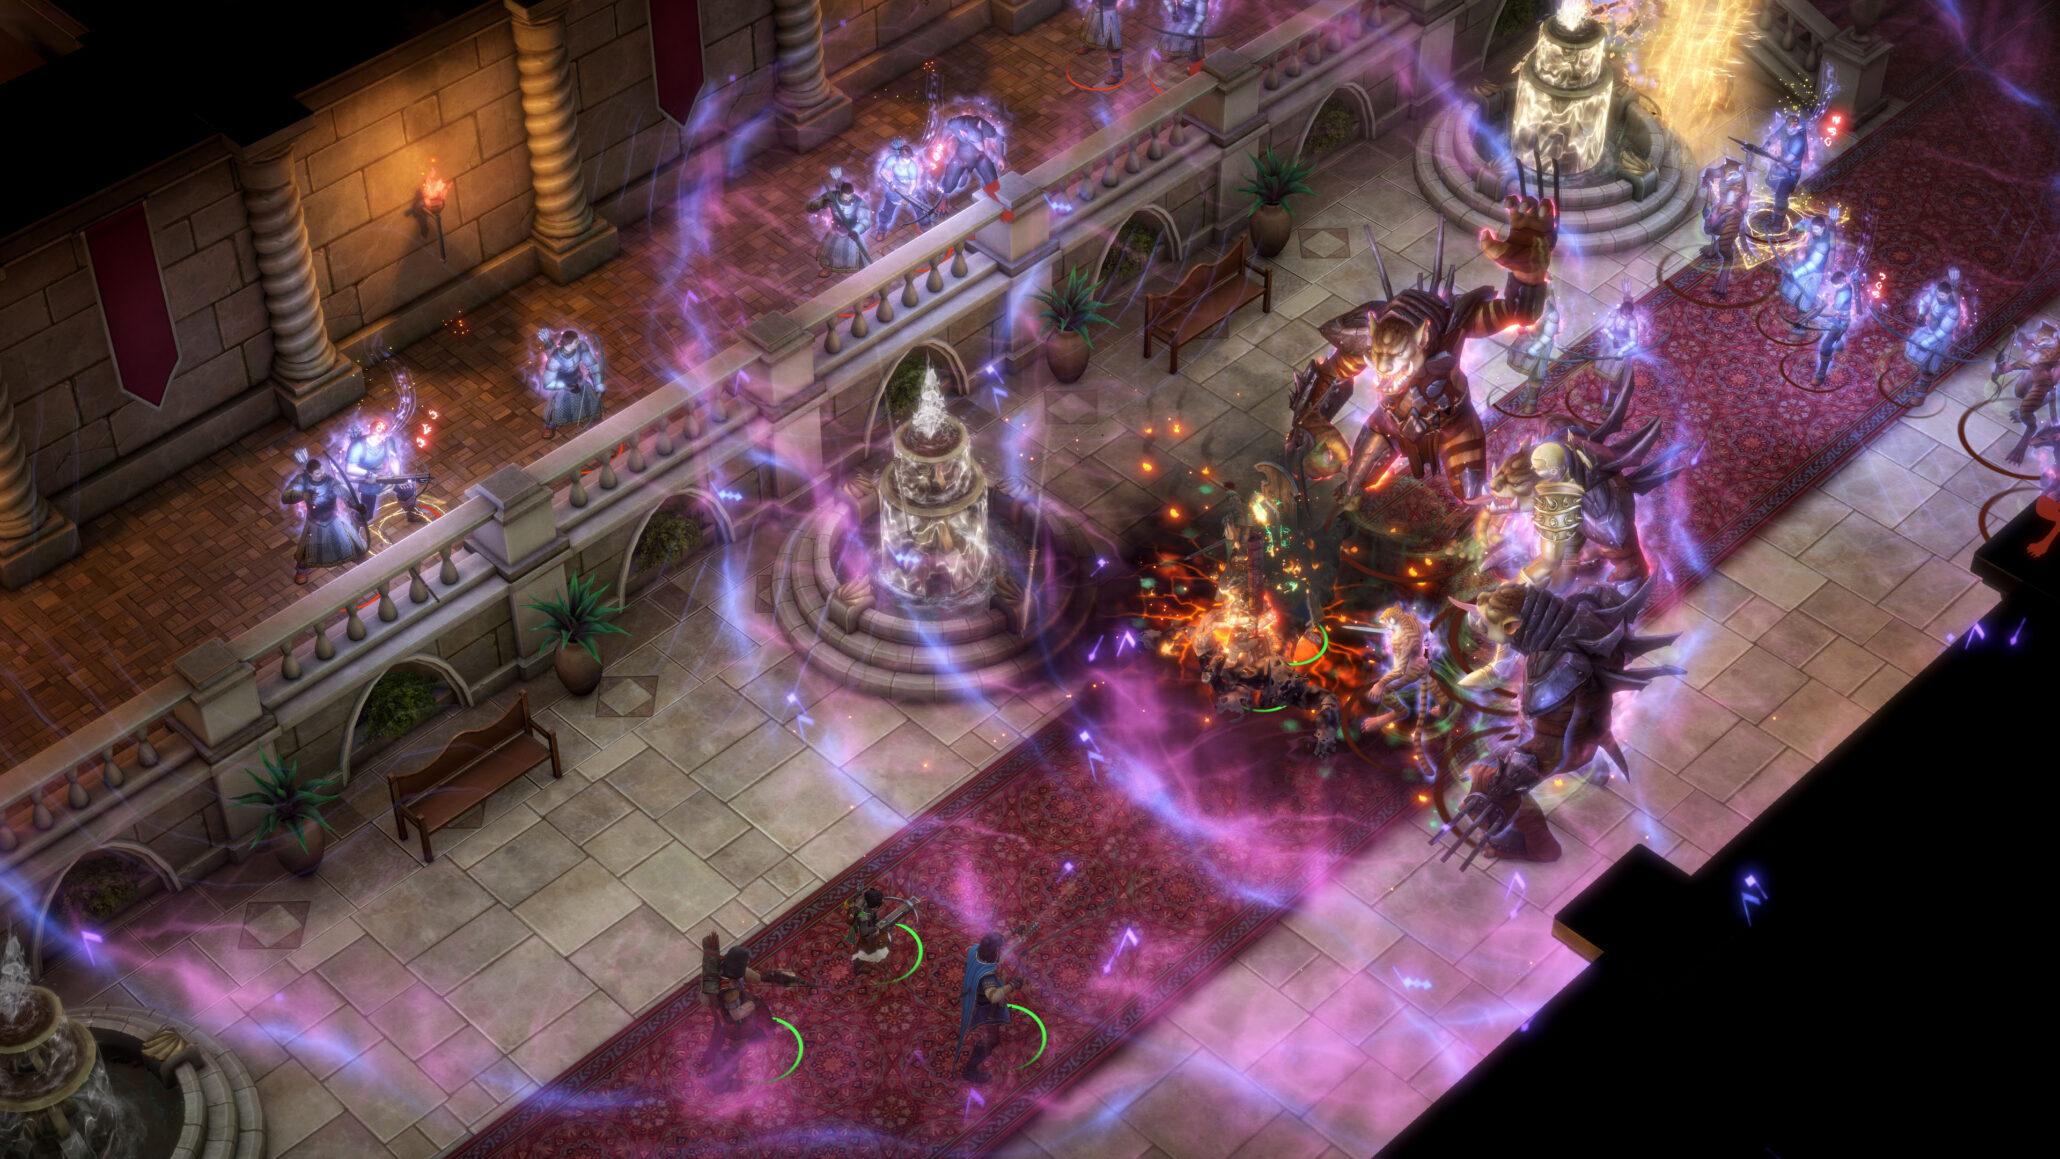 Pathfinder: Kingmaker Gets Season Pass and DLC Details